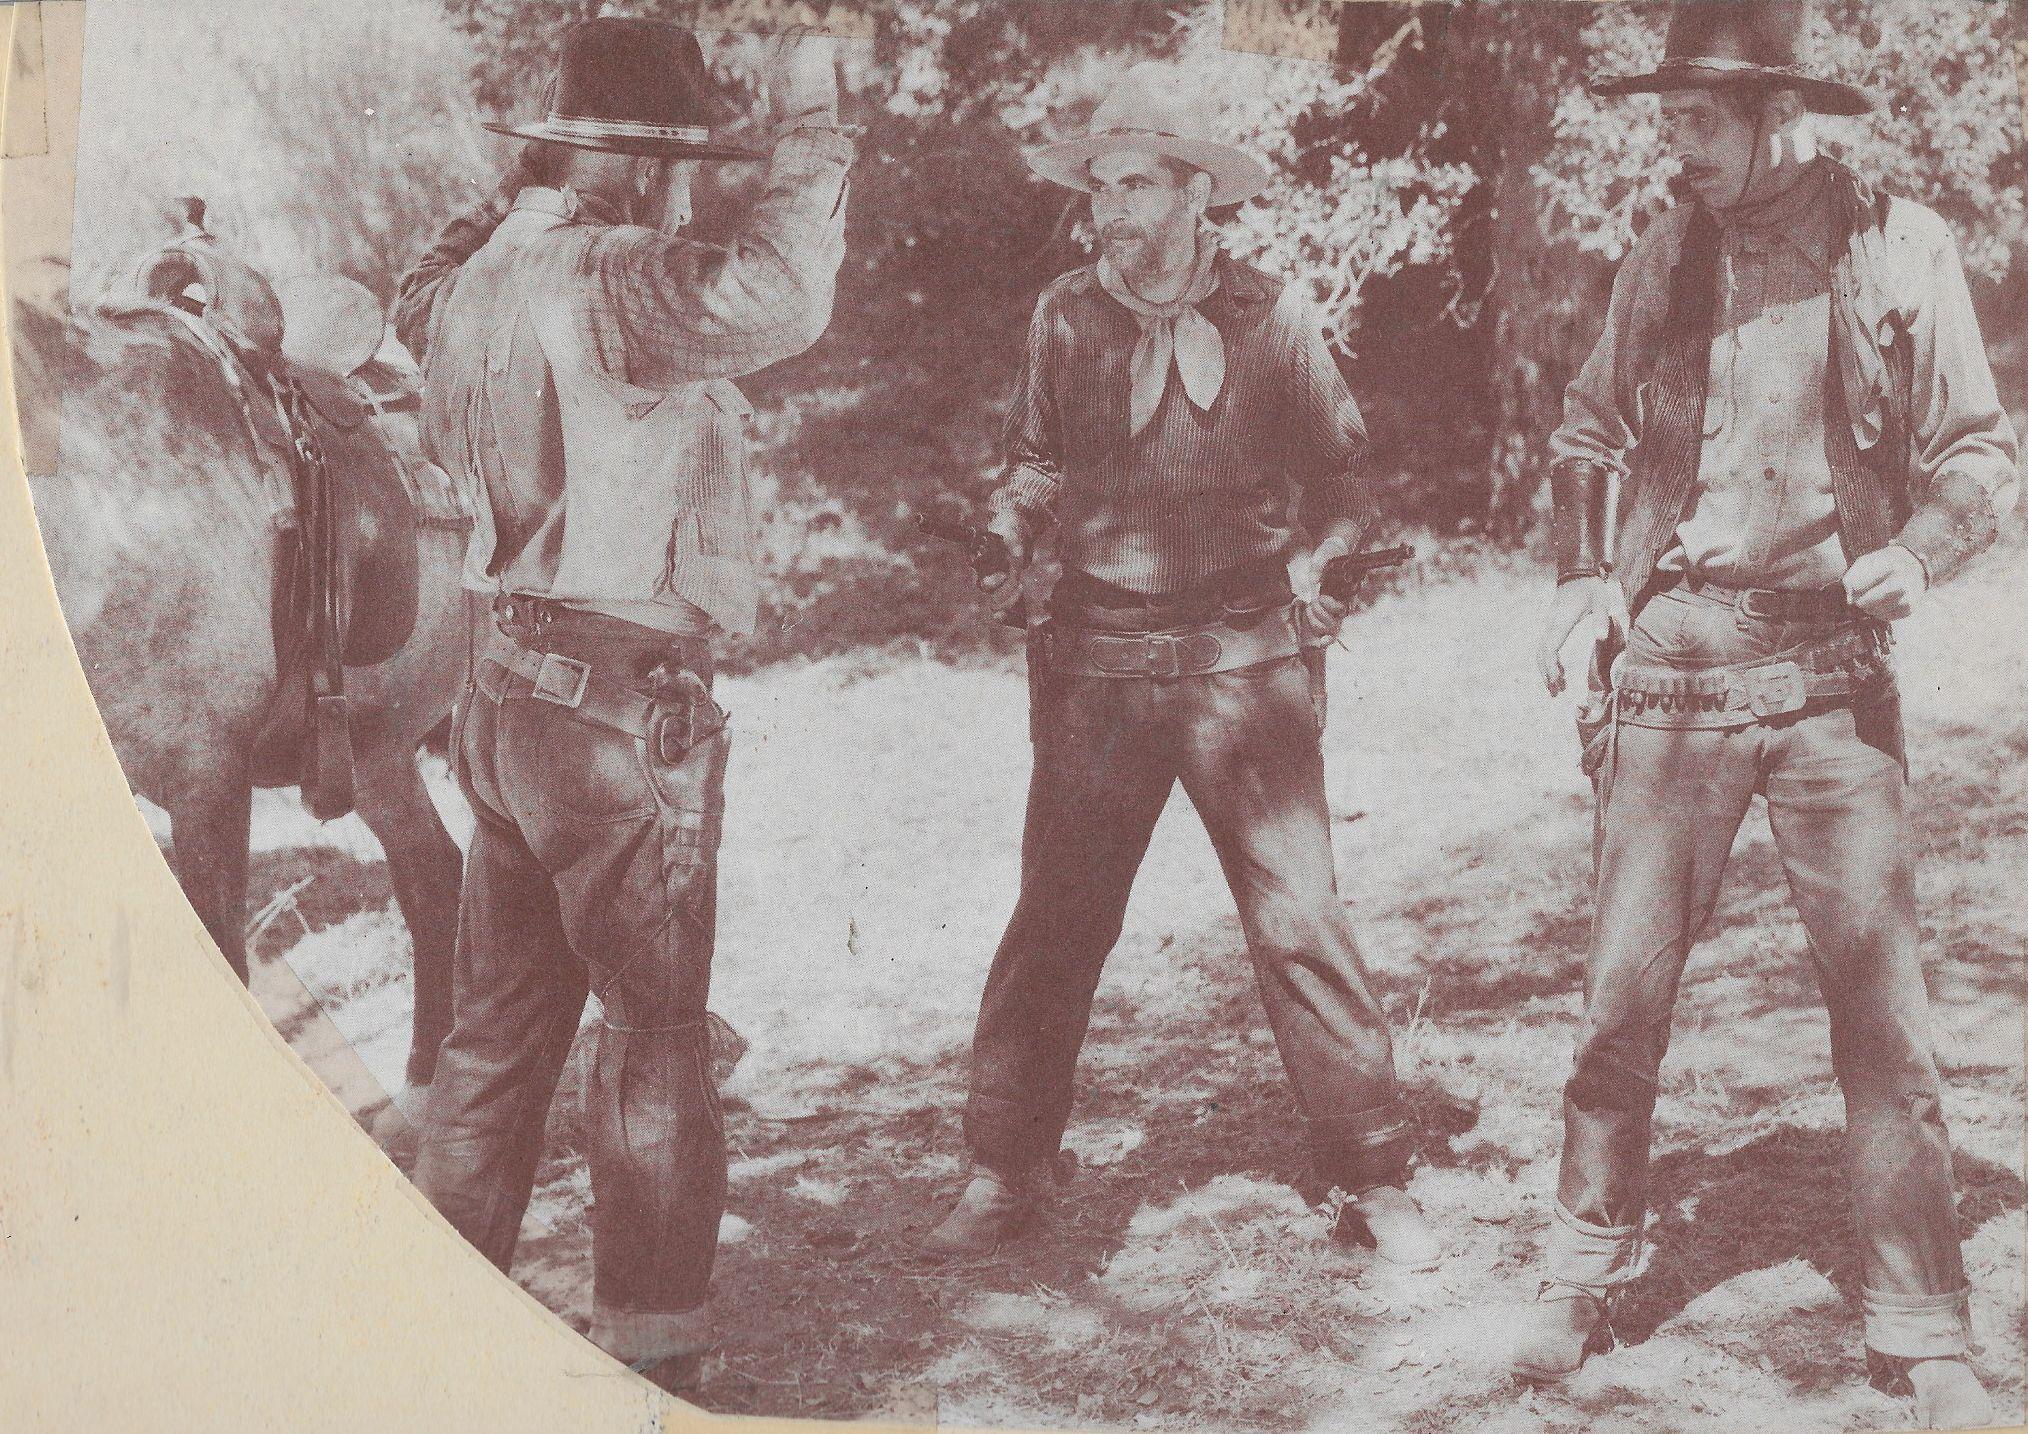 Ed Brady, George 'Gabby' Hayes, and Merrill McCormick in The Nevada Buckaroo (1931)